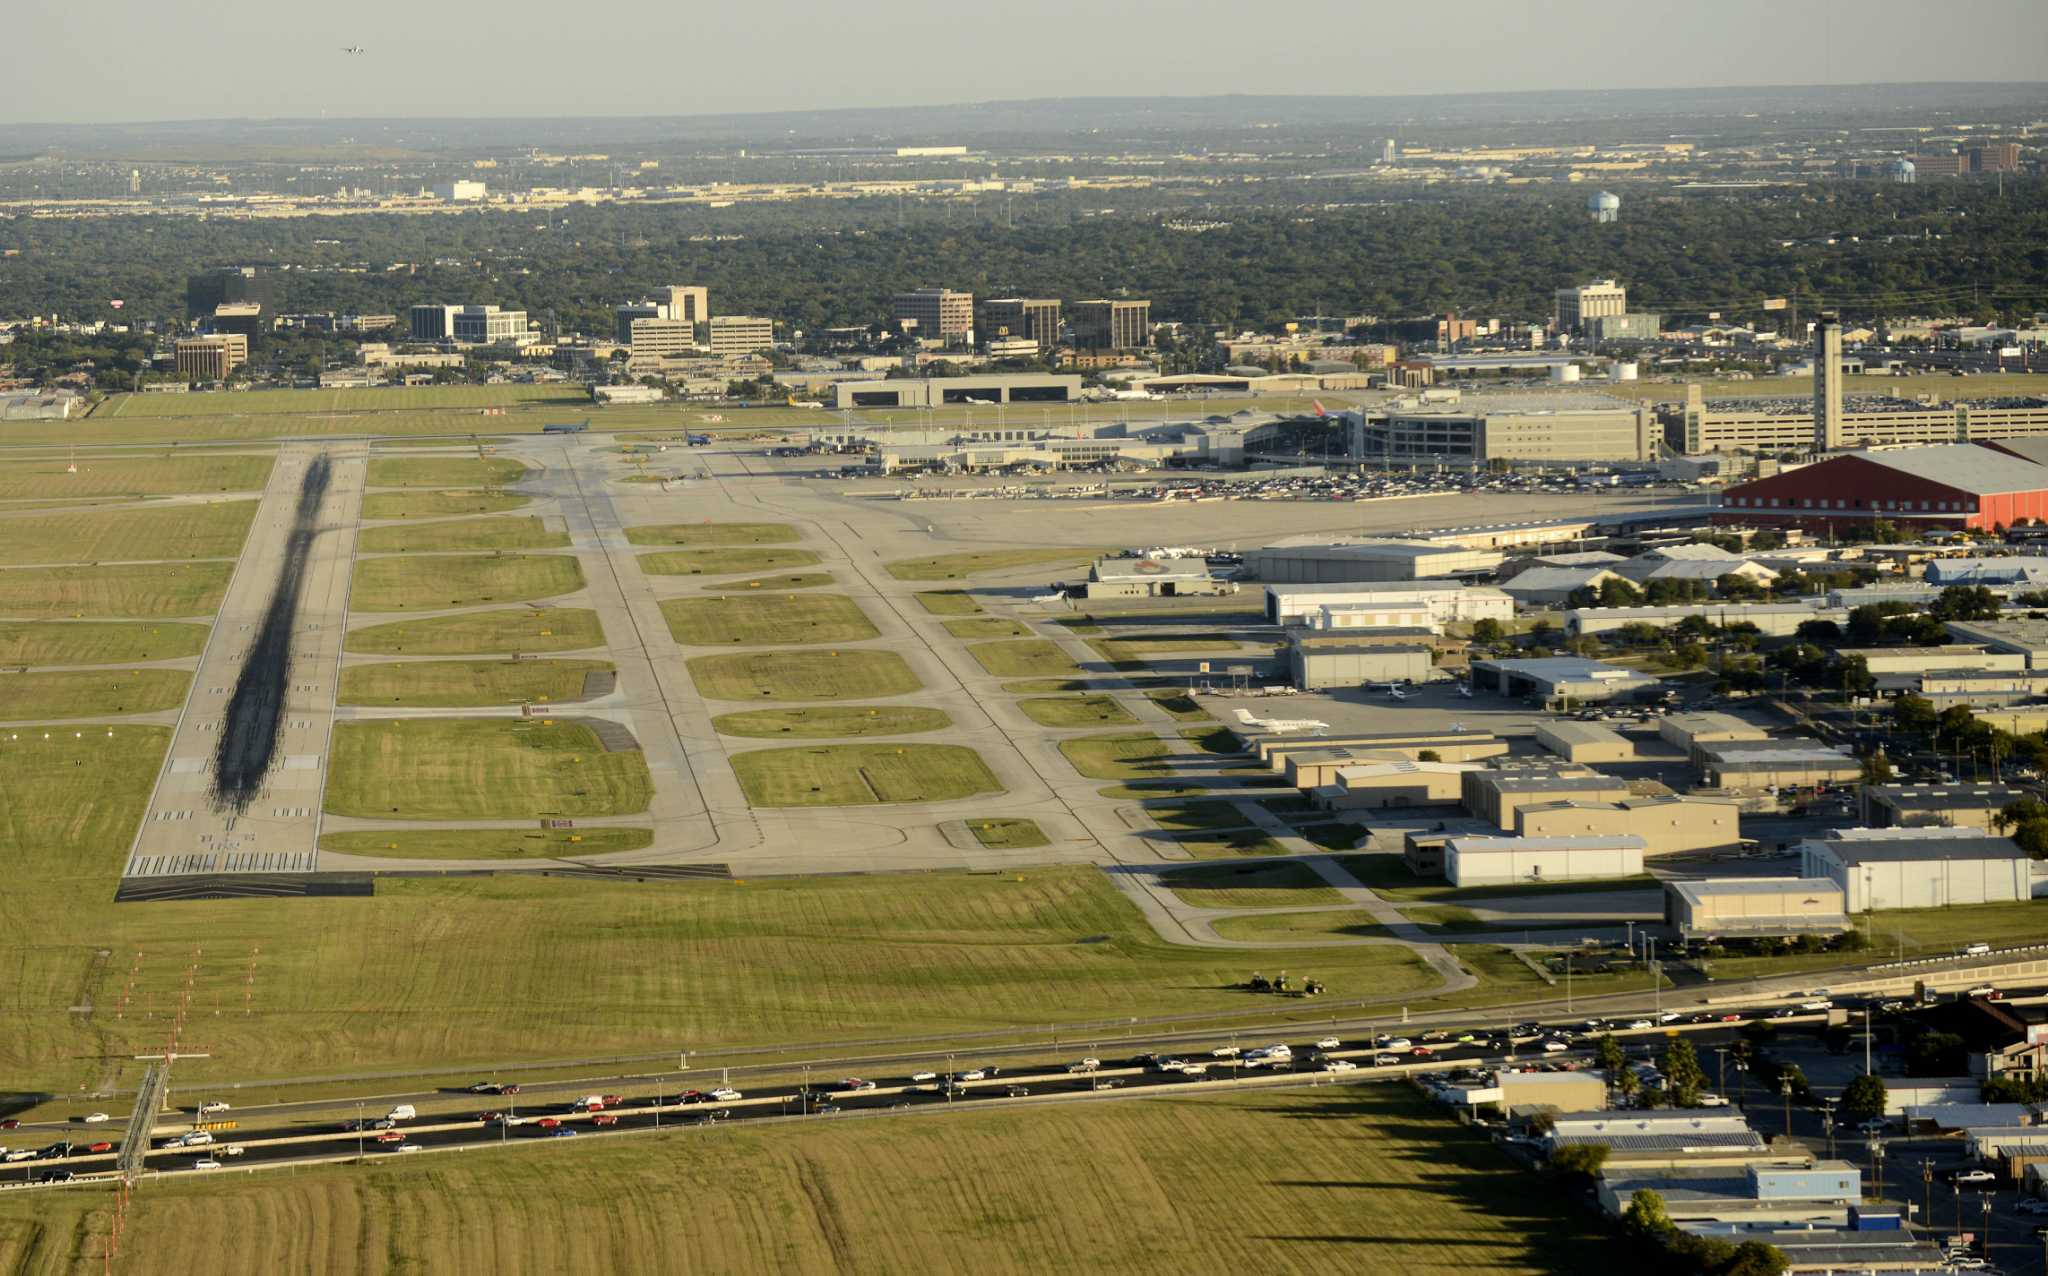 San Antonio Airport Gets New Low Cost Airline 2 Nonstop